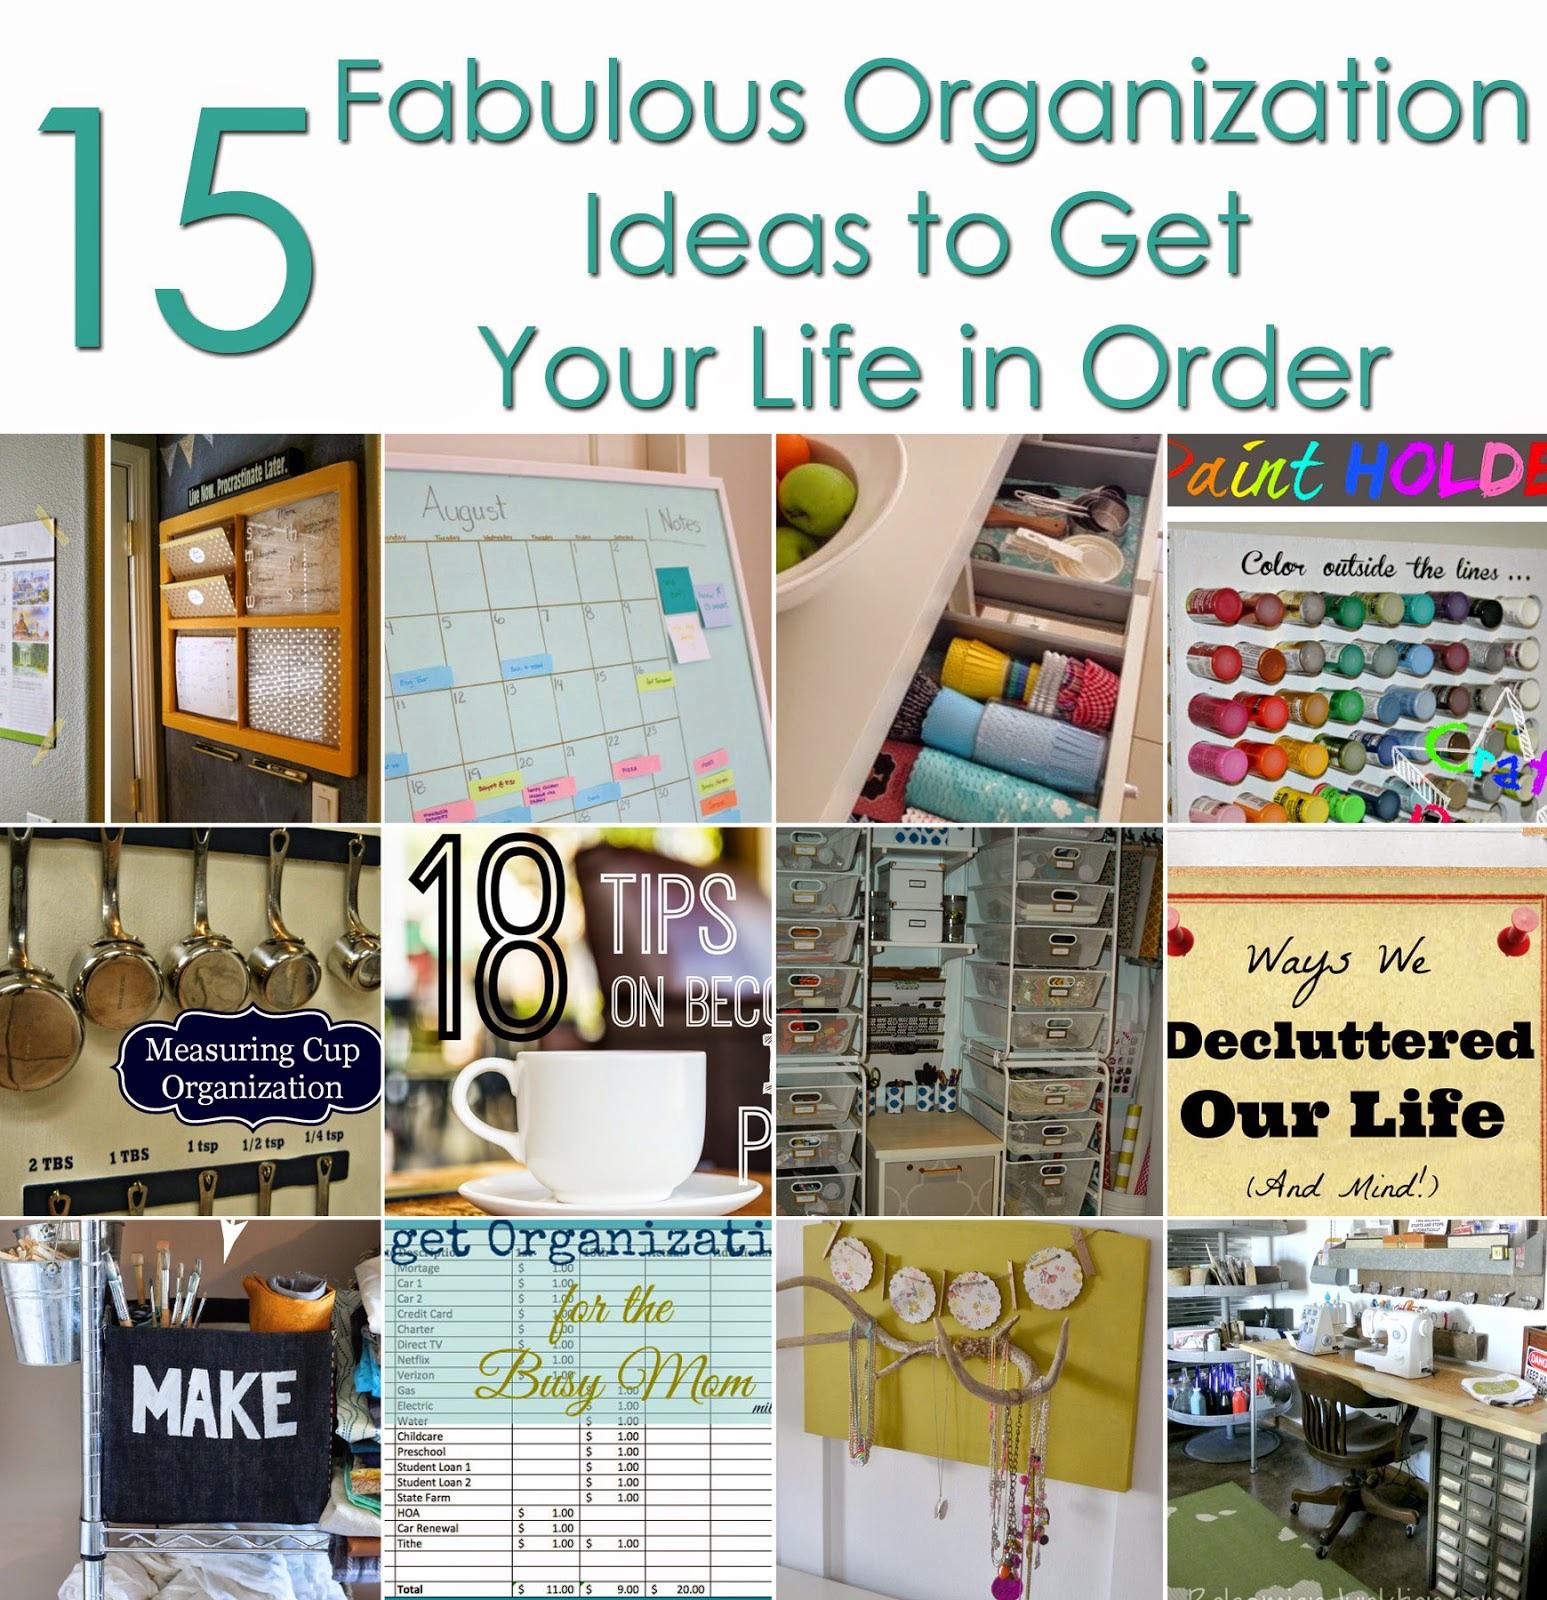 15 Fabulous Organization Ideas